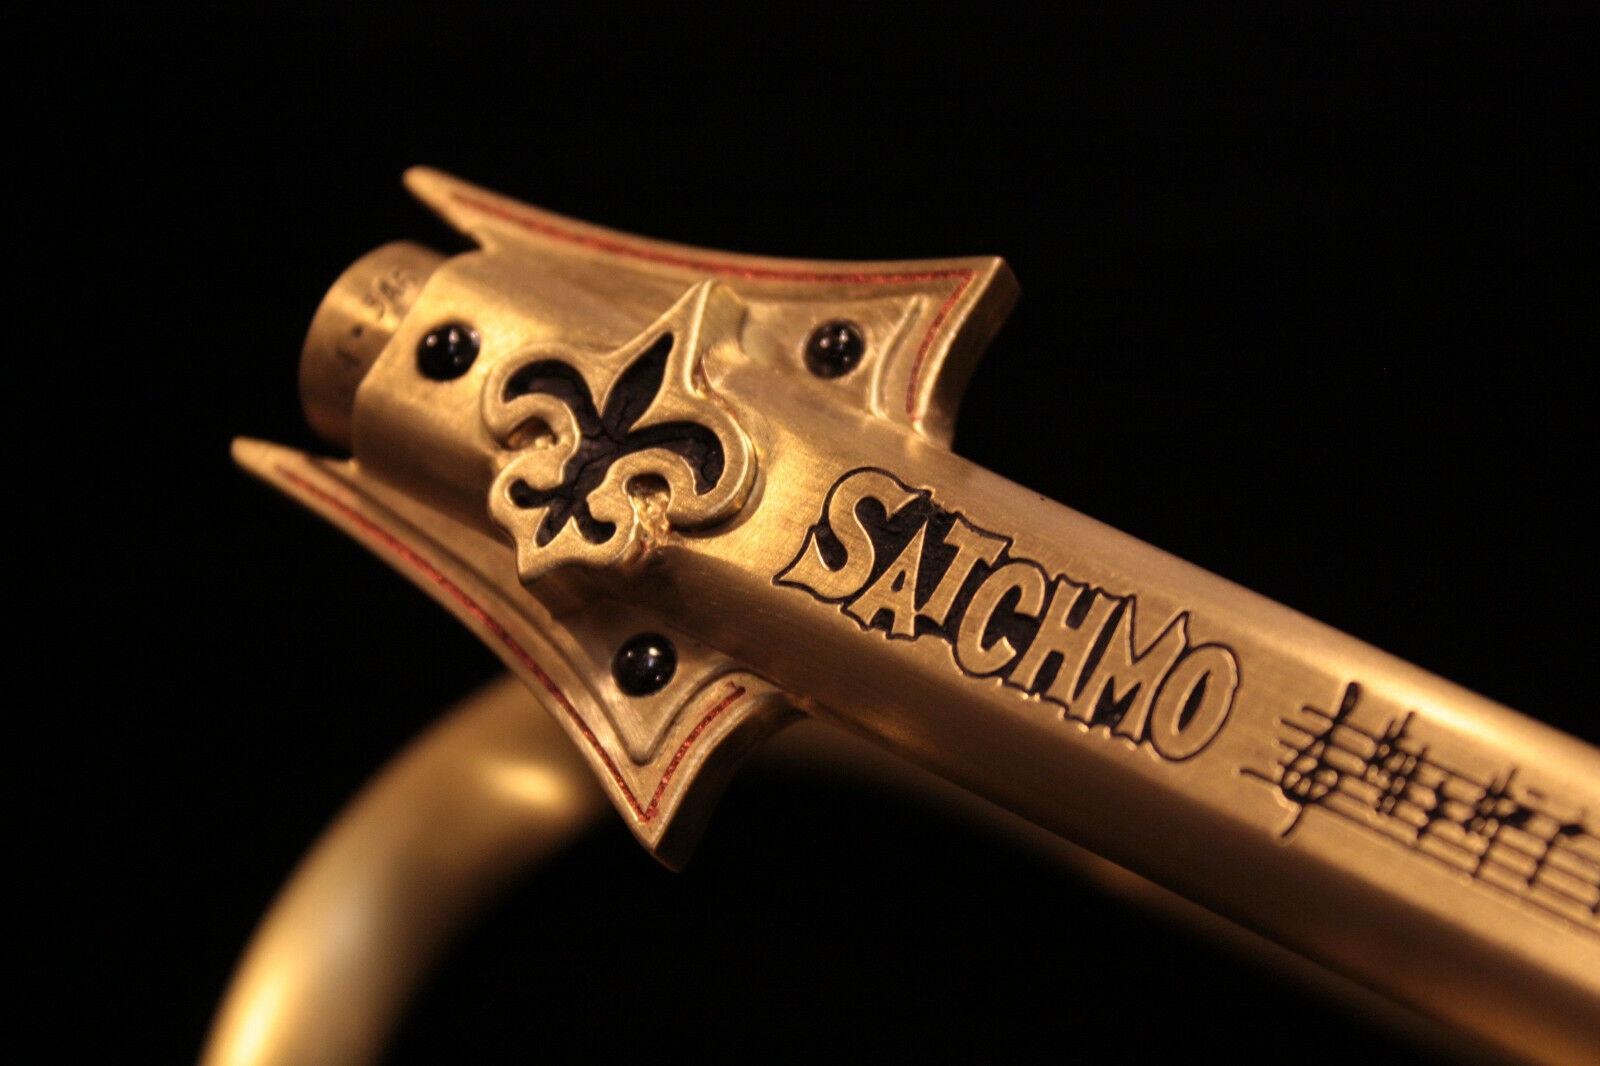 Harrelson Summit Art Trumpet price